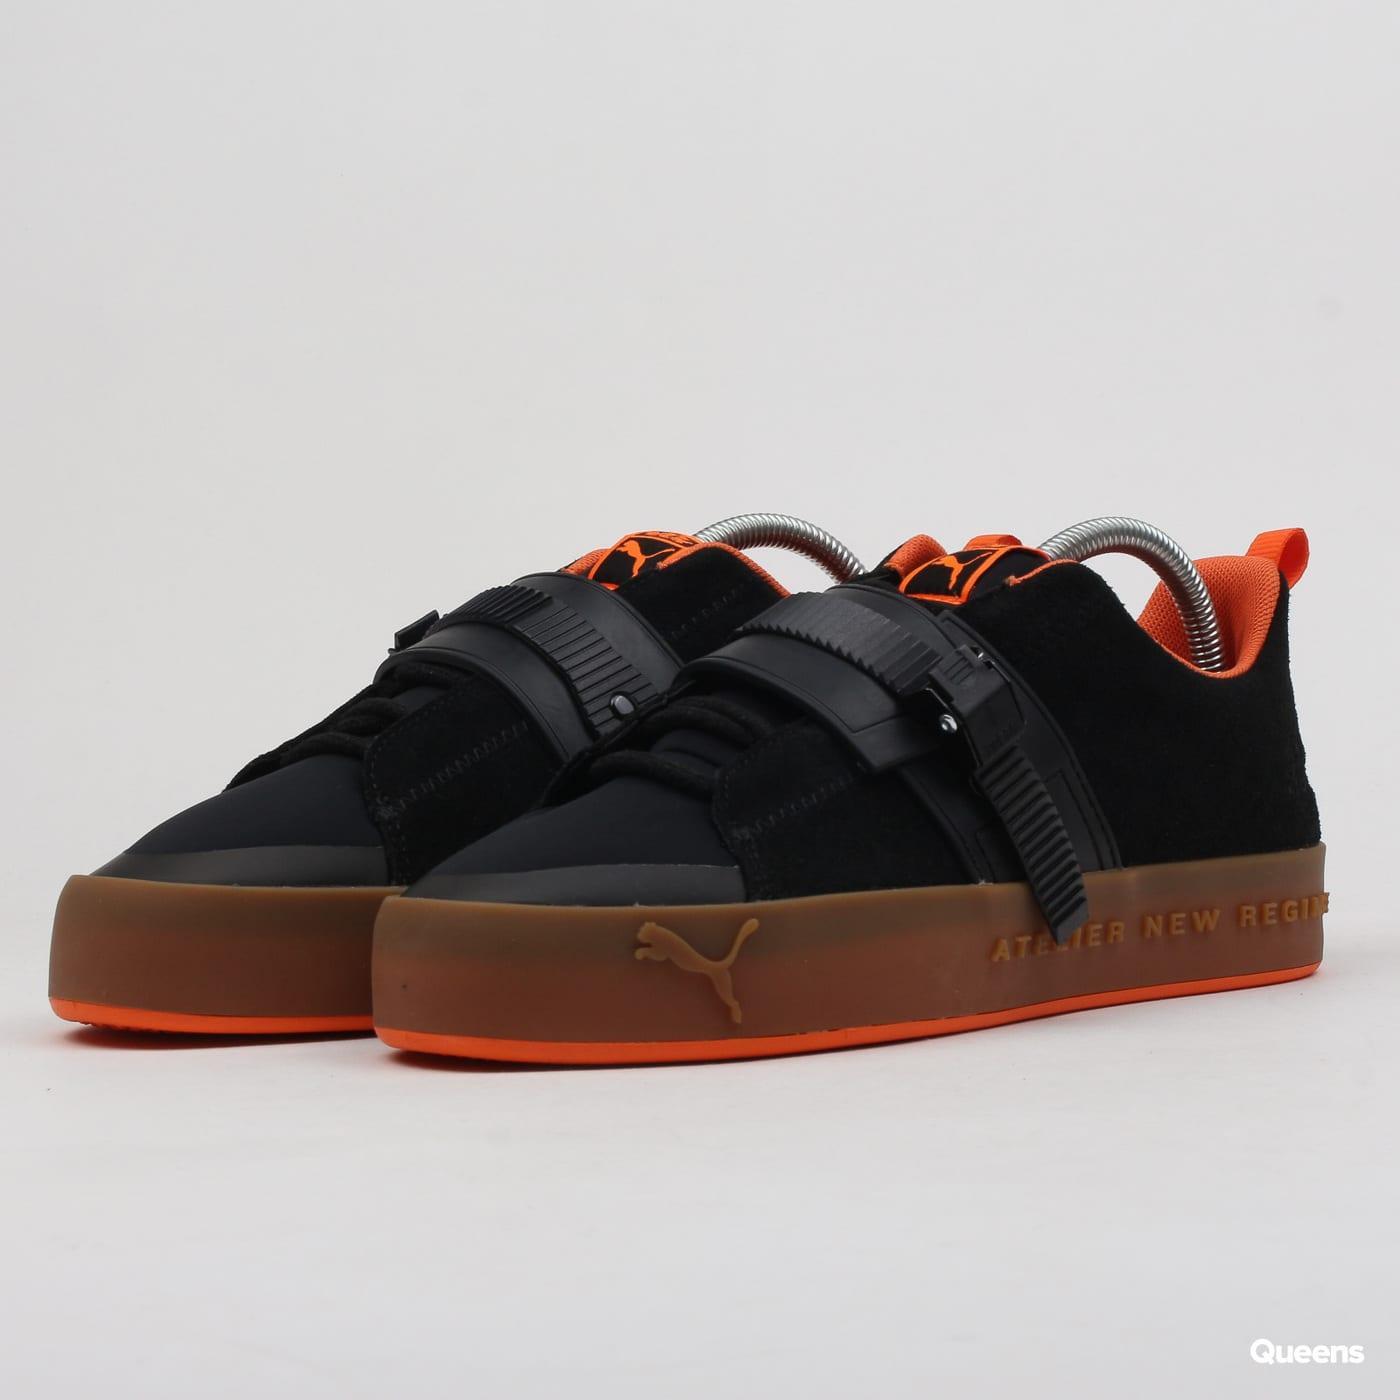 Sneakers Puma Court Tsugi Jun x ATELIER NEW REGIME (366537 02)– Queens 💚 d58338264